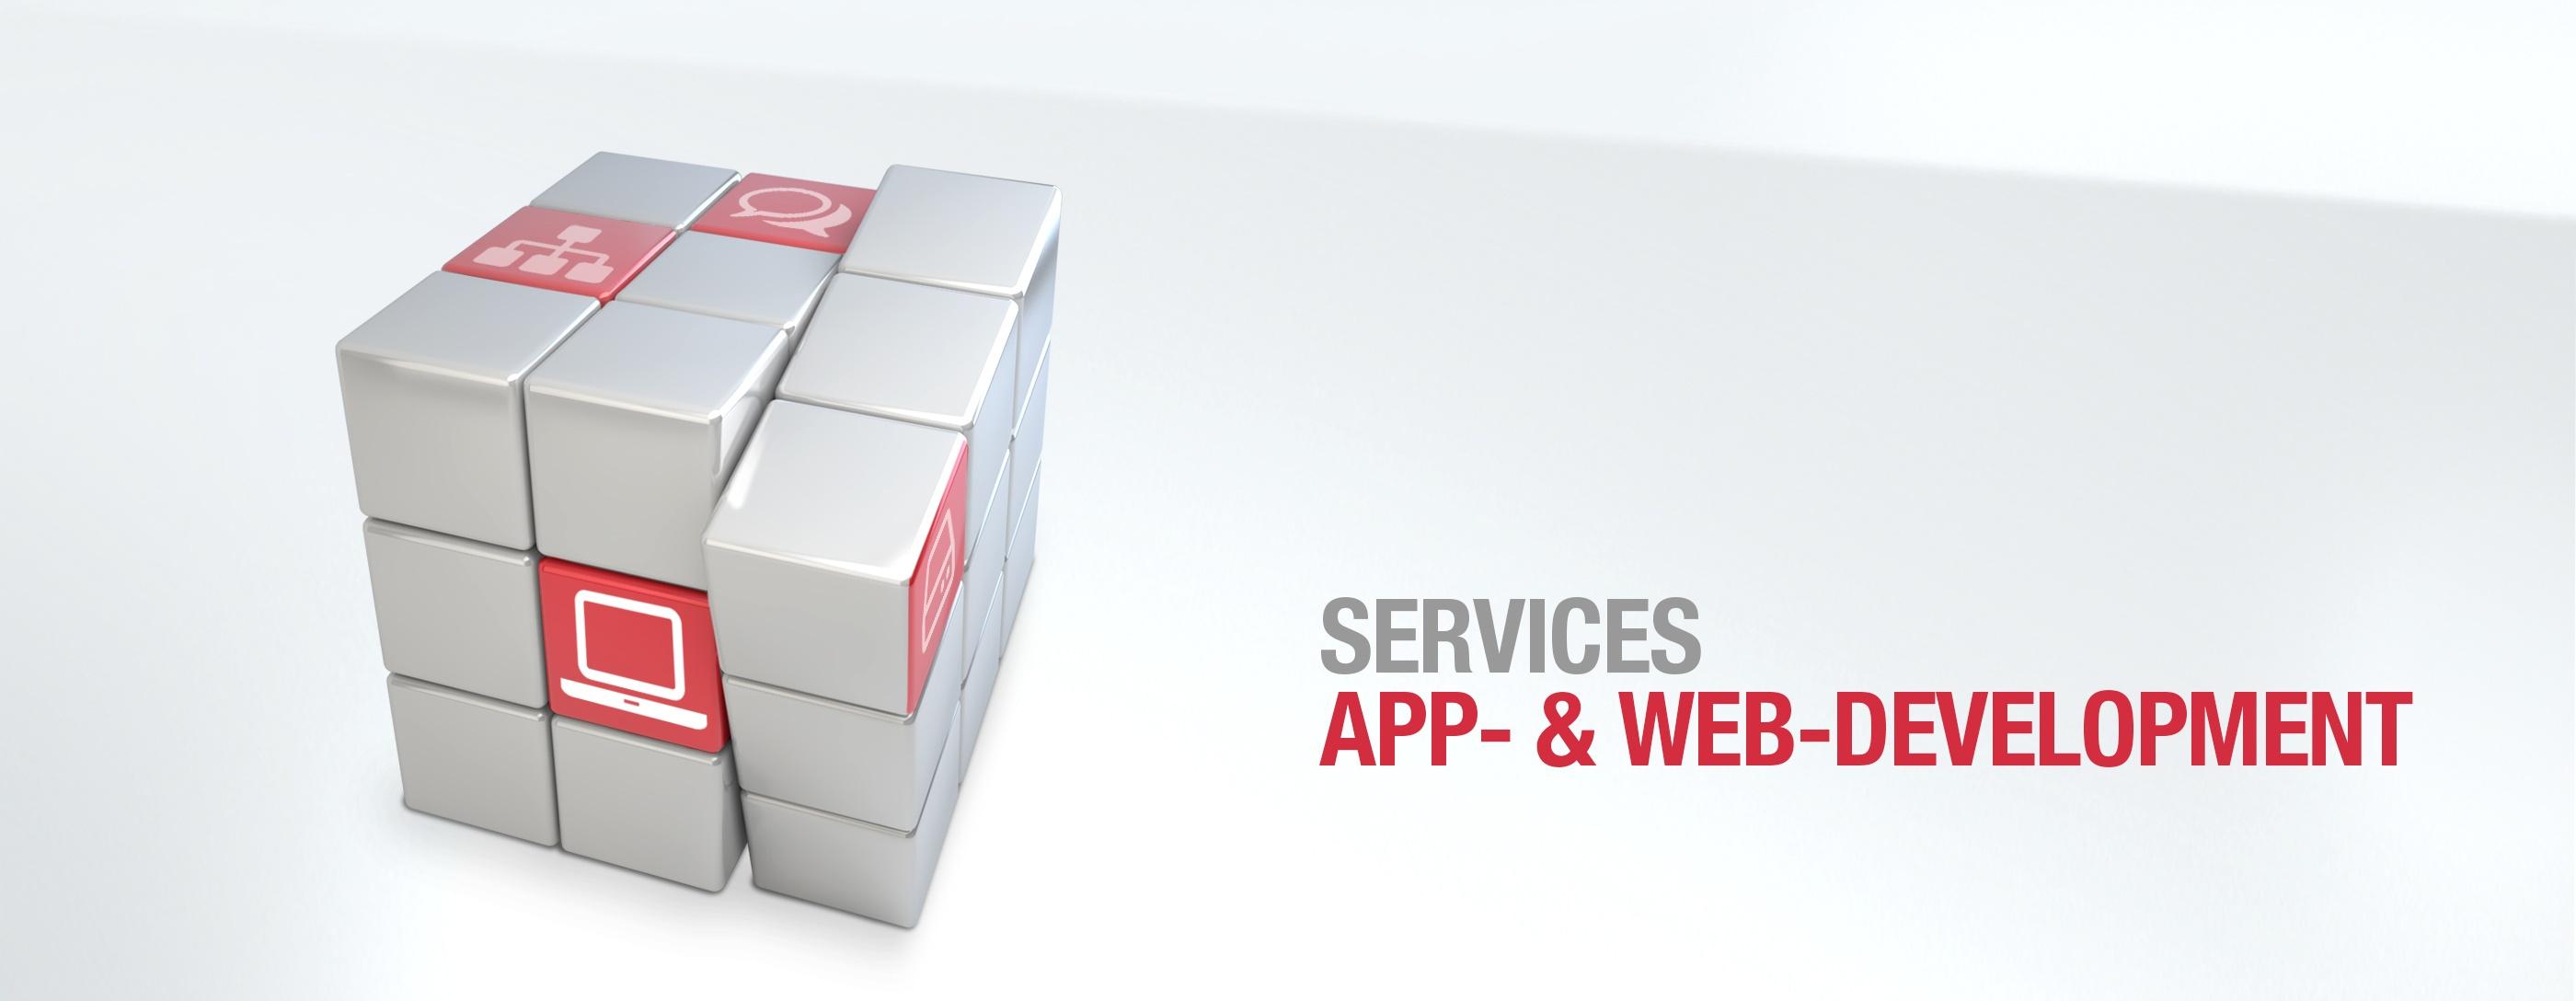 170830_leistungen_app_webdevelopment_en.jpg